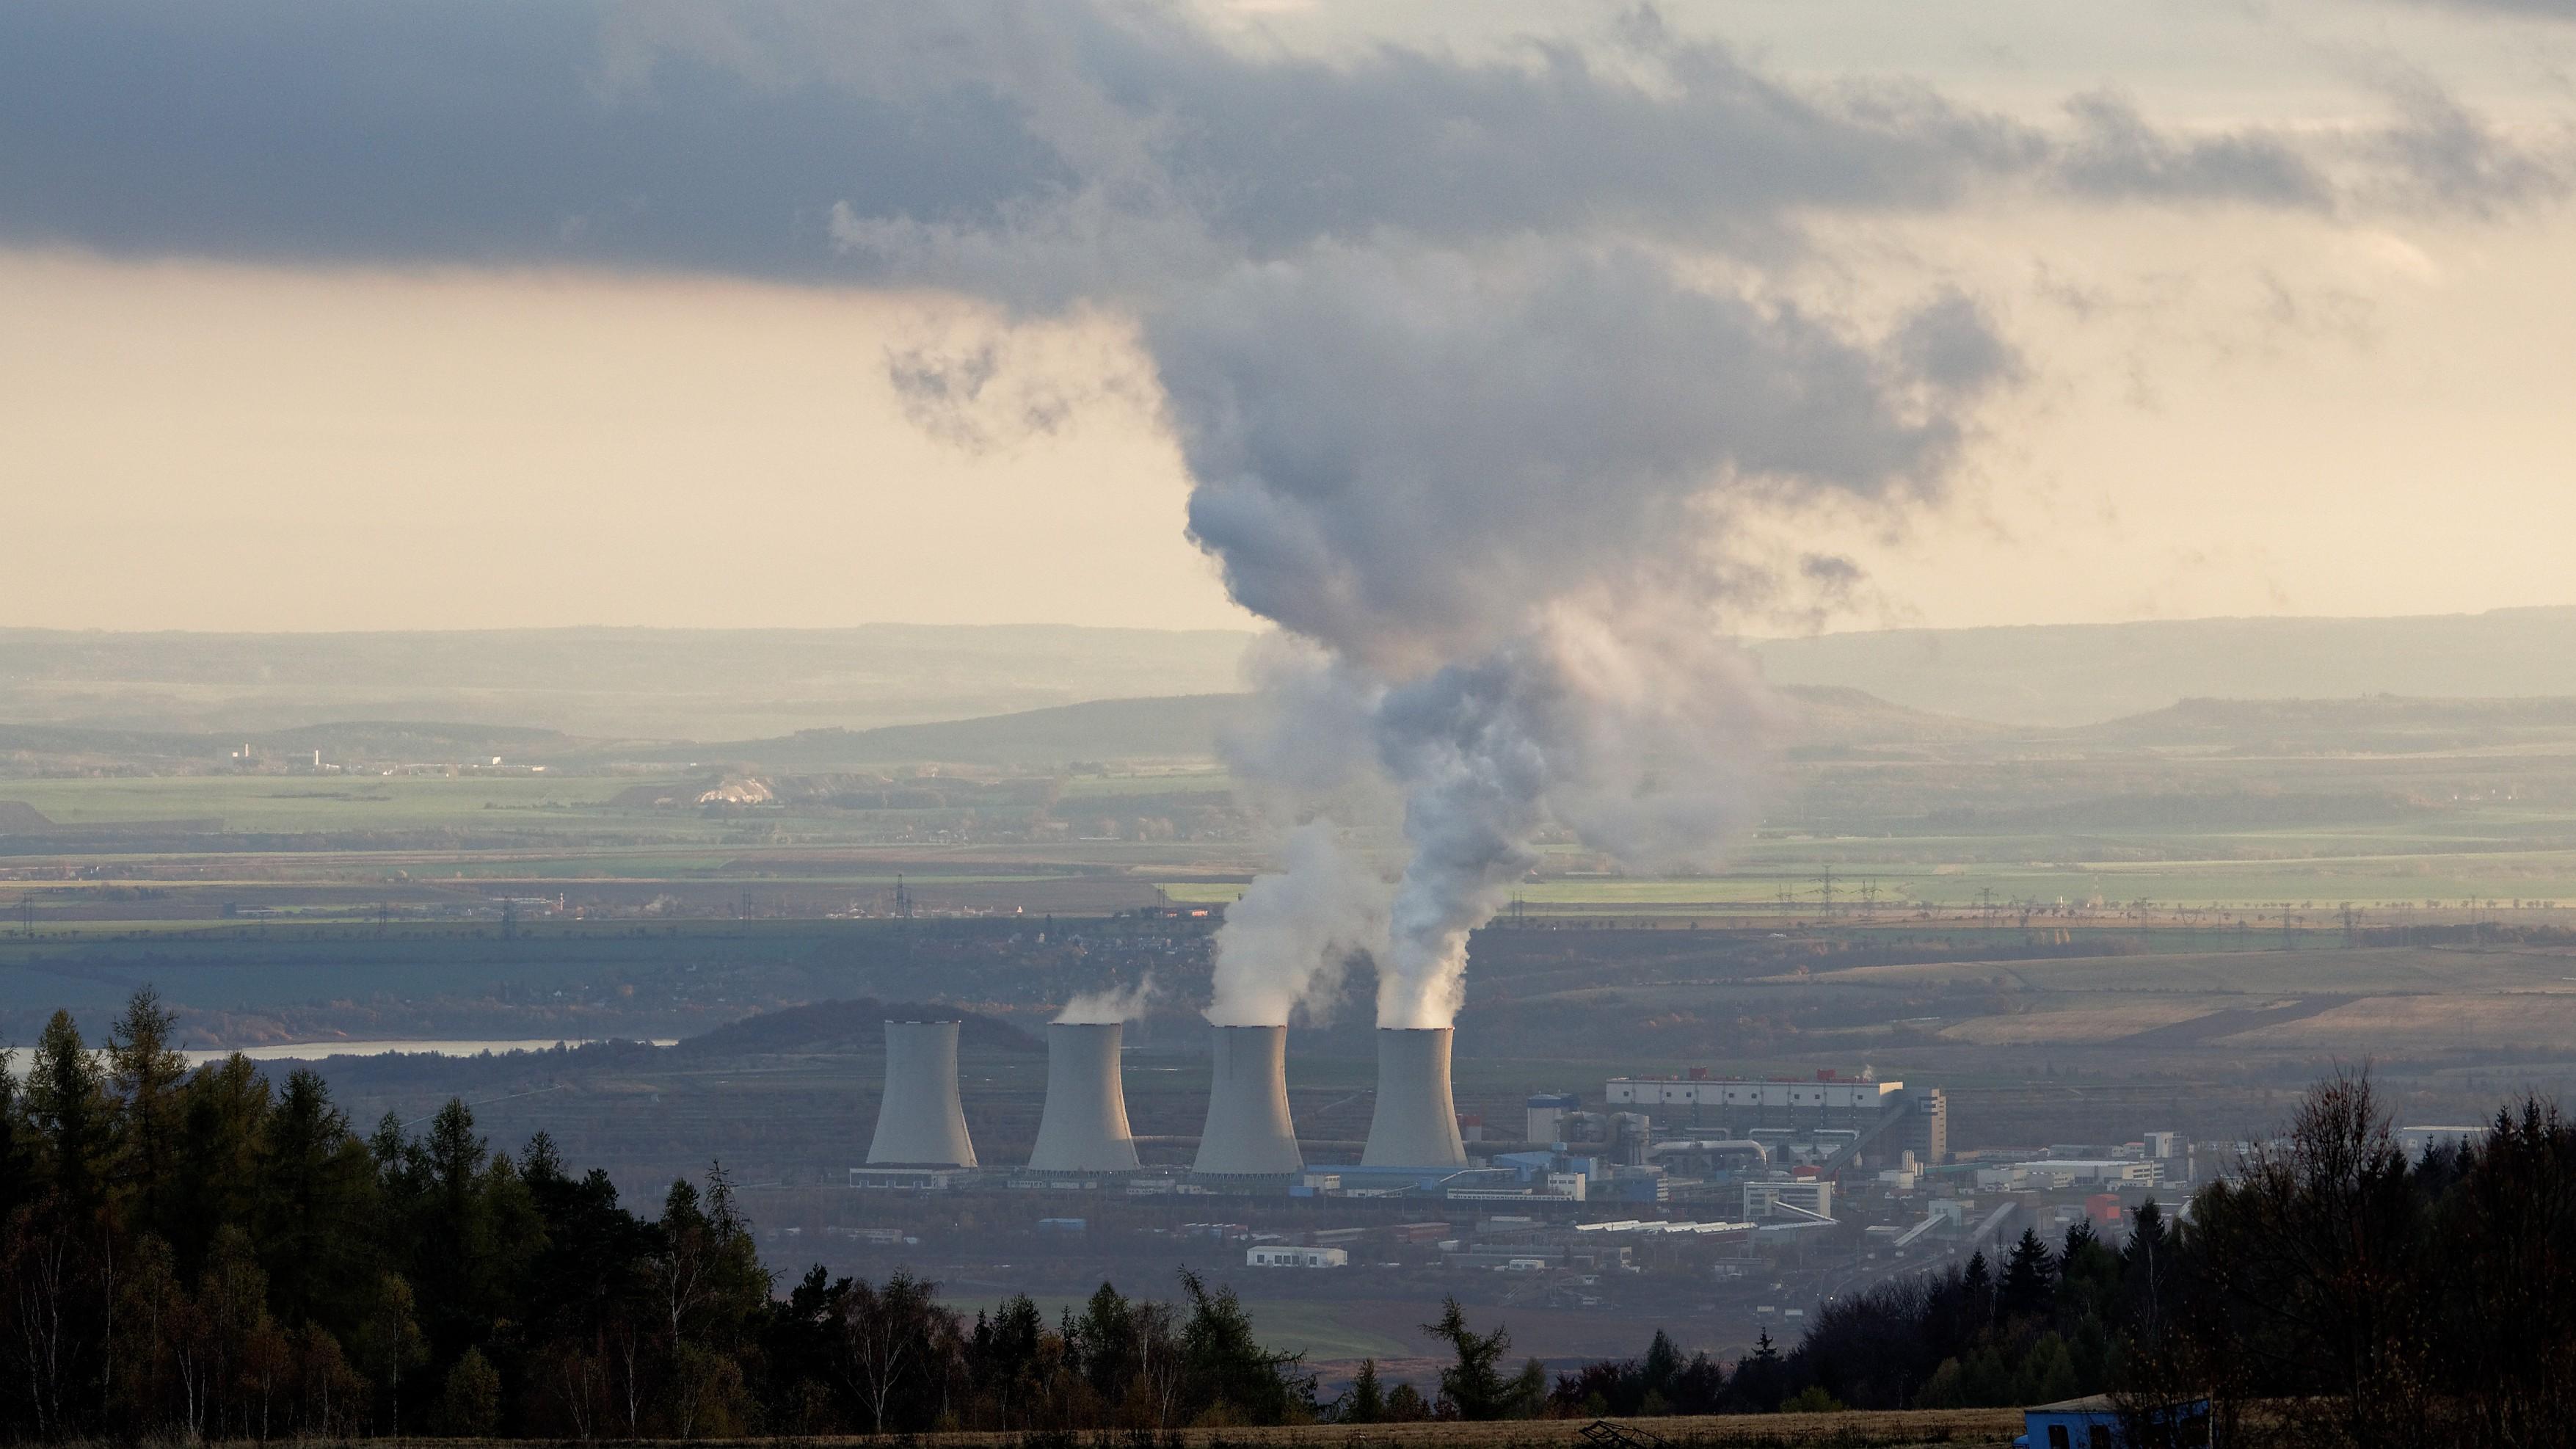 Kohlekraftwerk Tusmice im Nordwesten Tschechiens. Foto: Tilo Arnhold/TROPOS